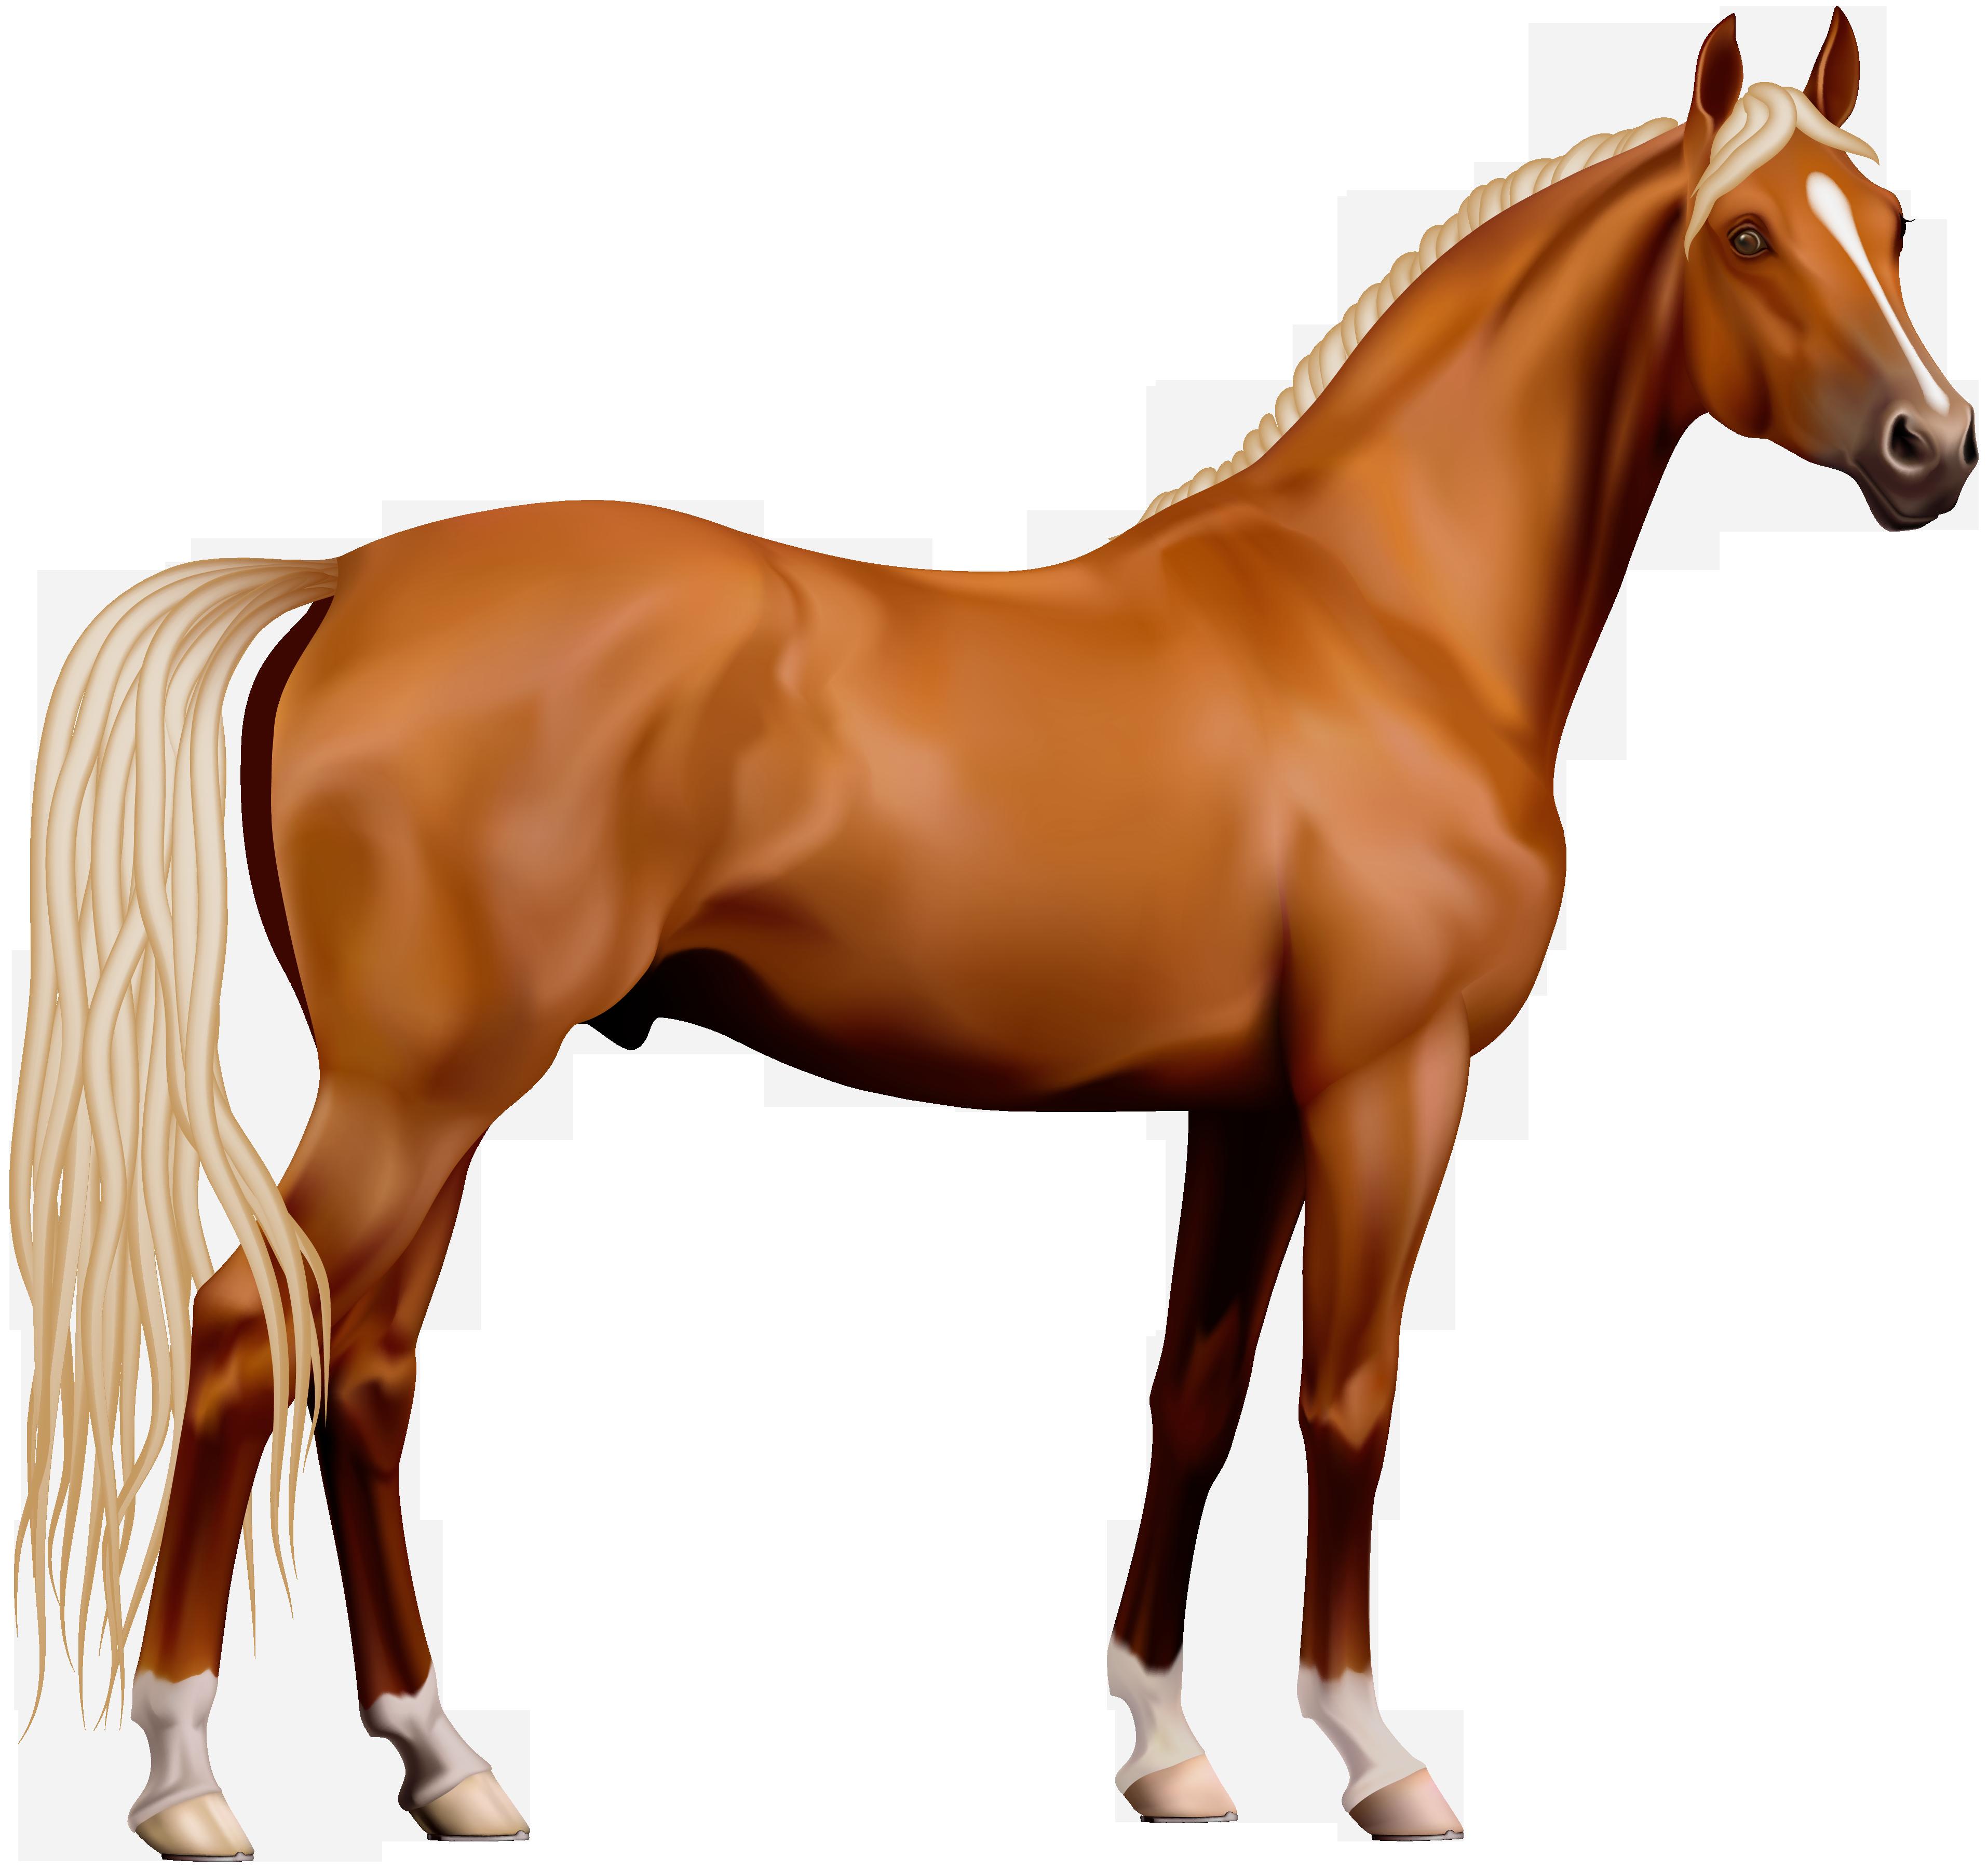 Transparent Horse PNG Clipart.